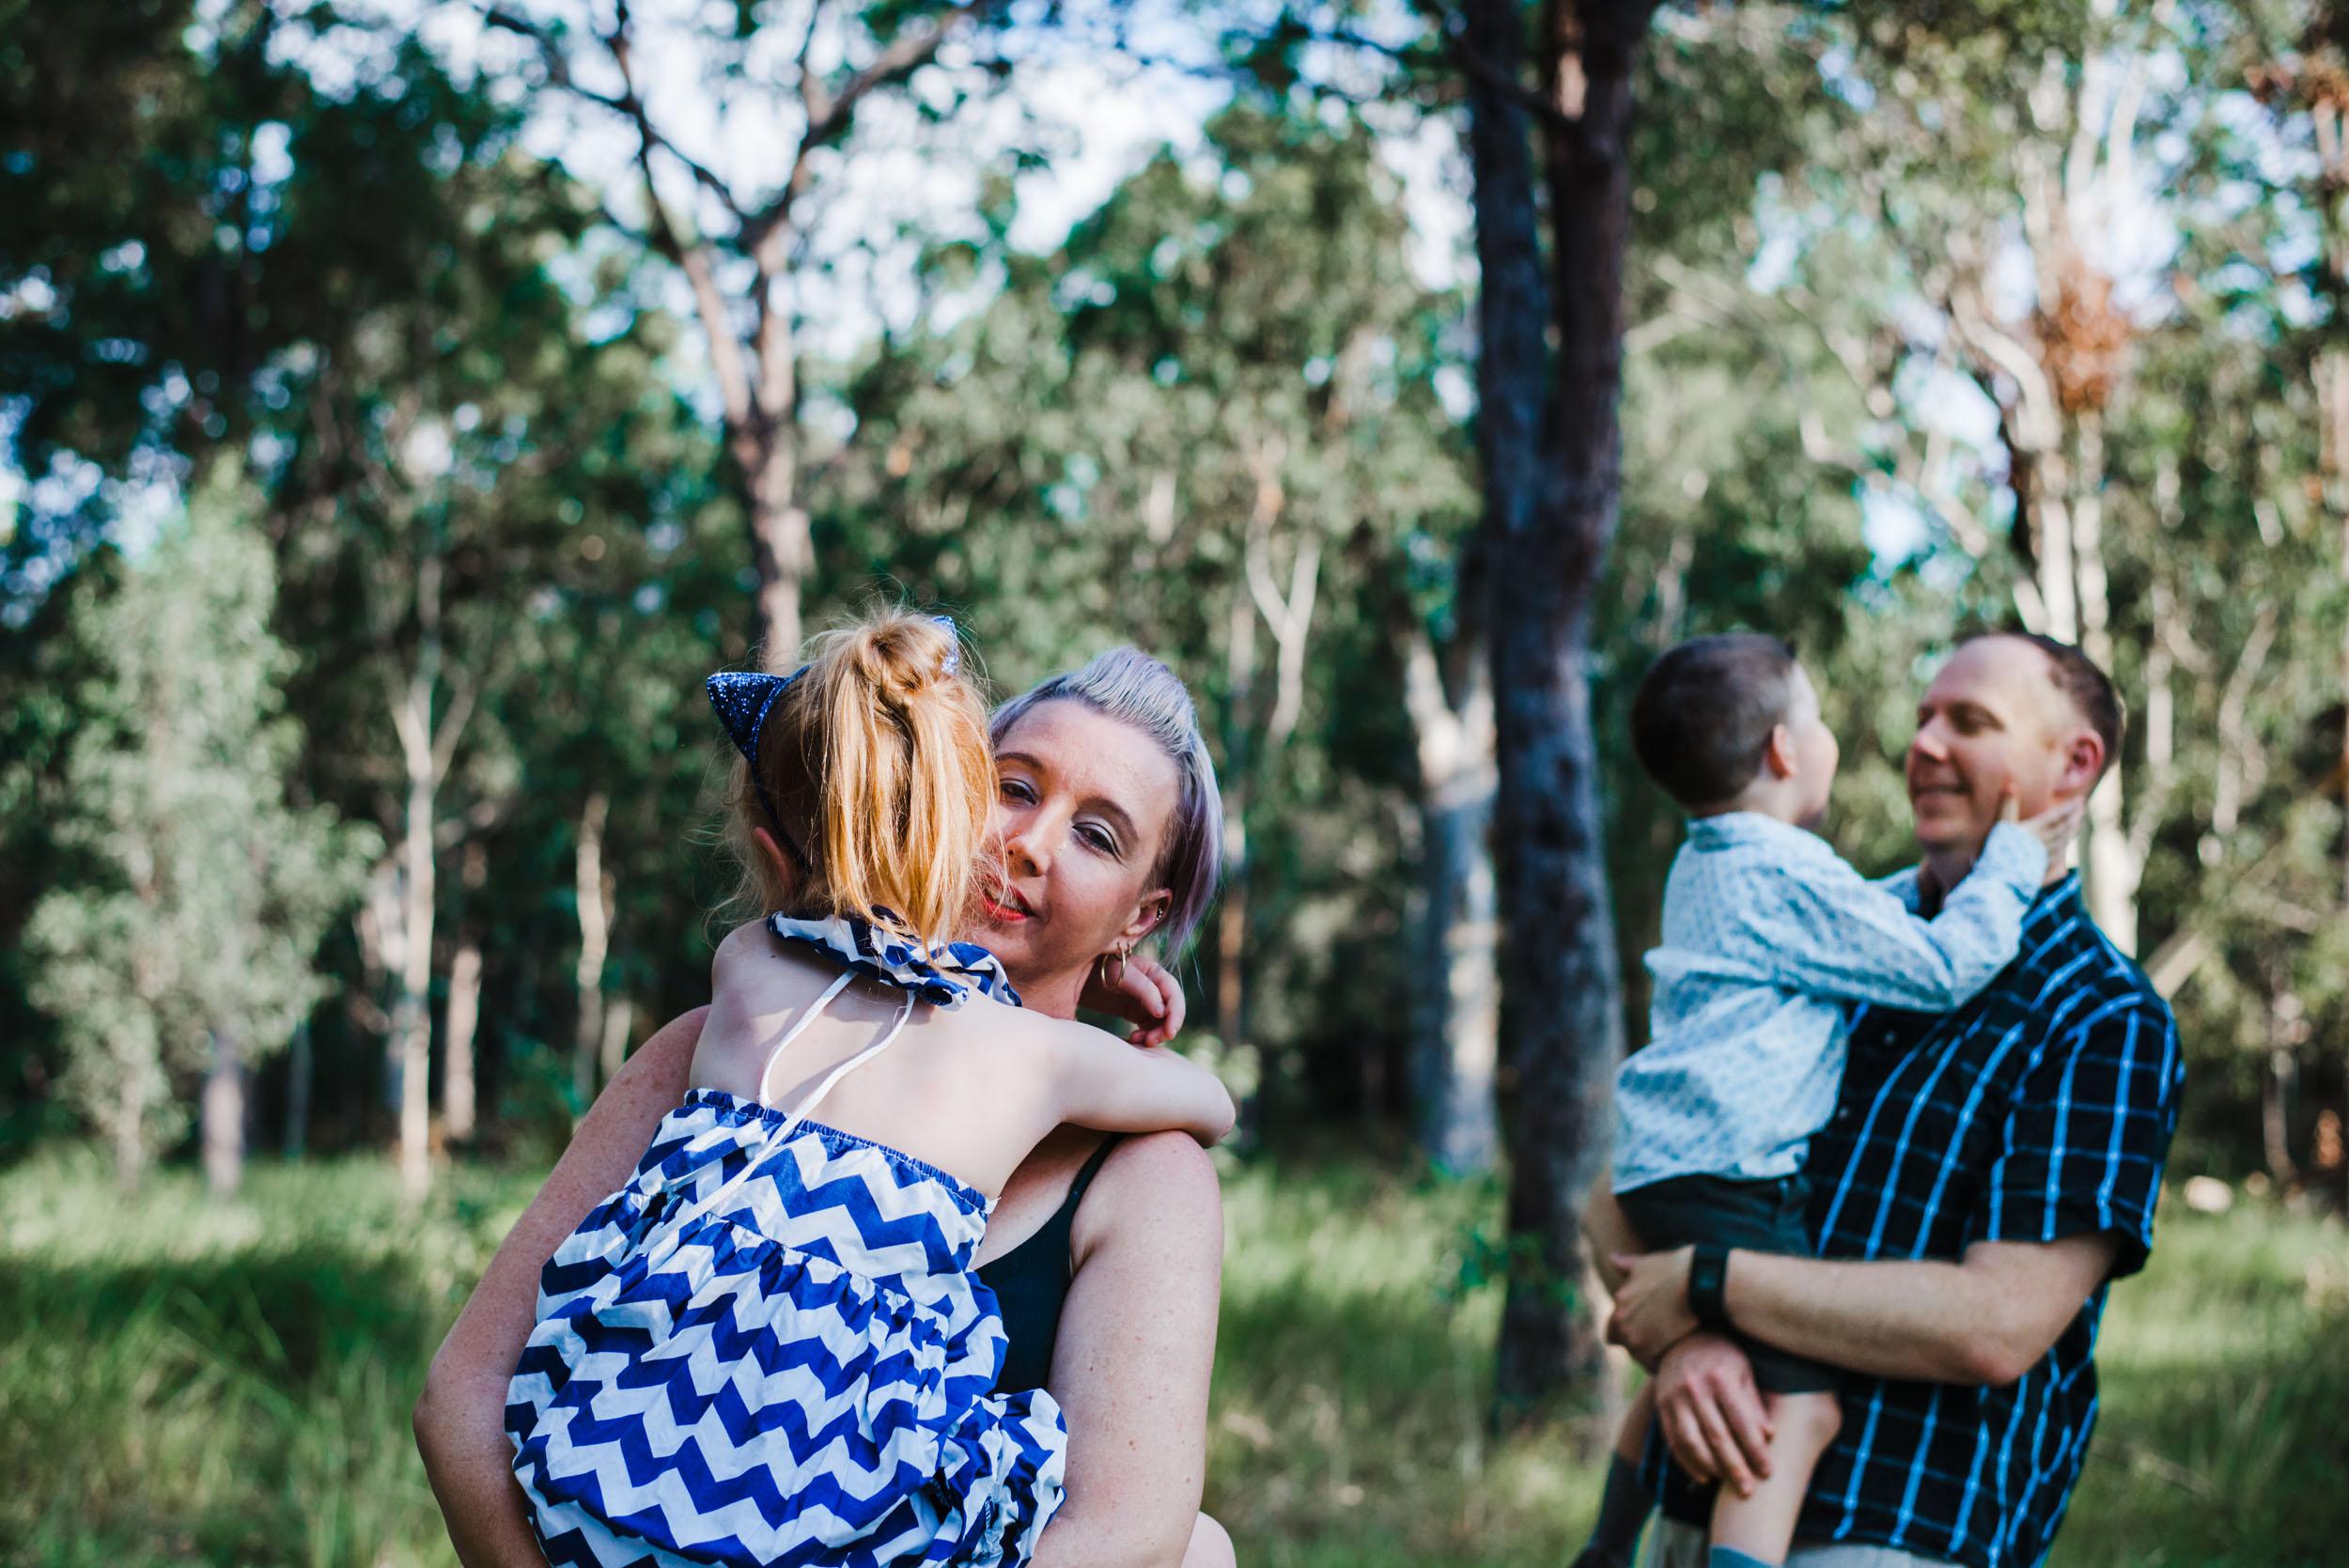 mum-daughter-dad-son-in-bush.jpg